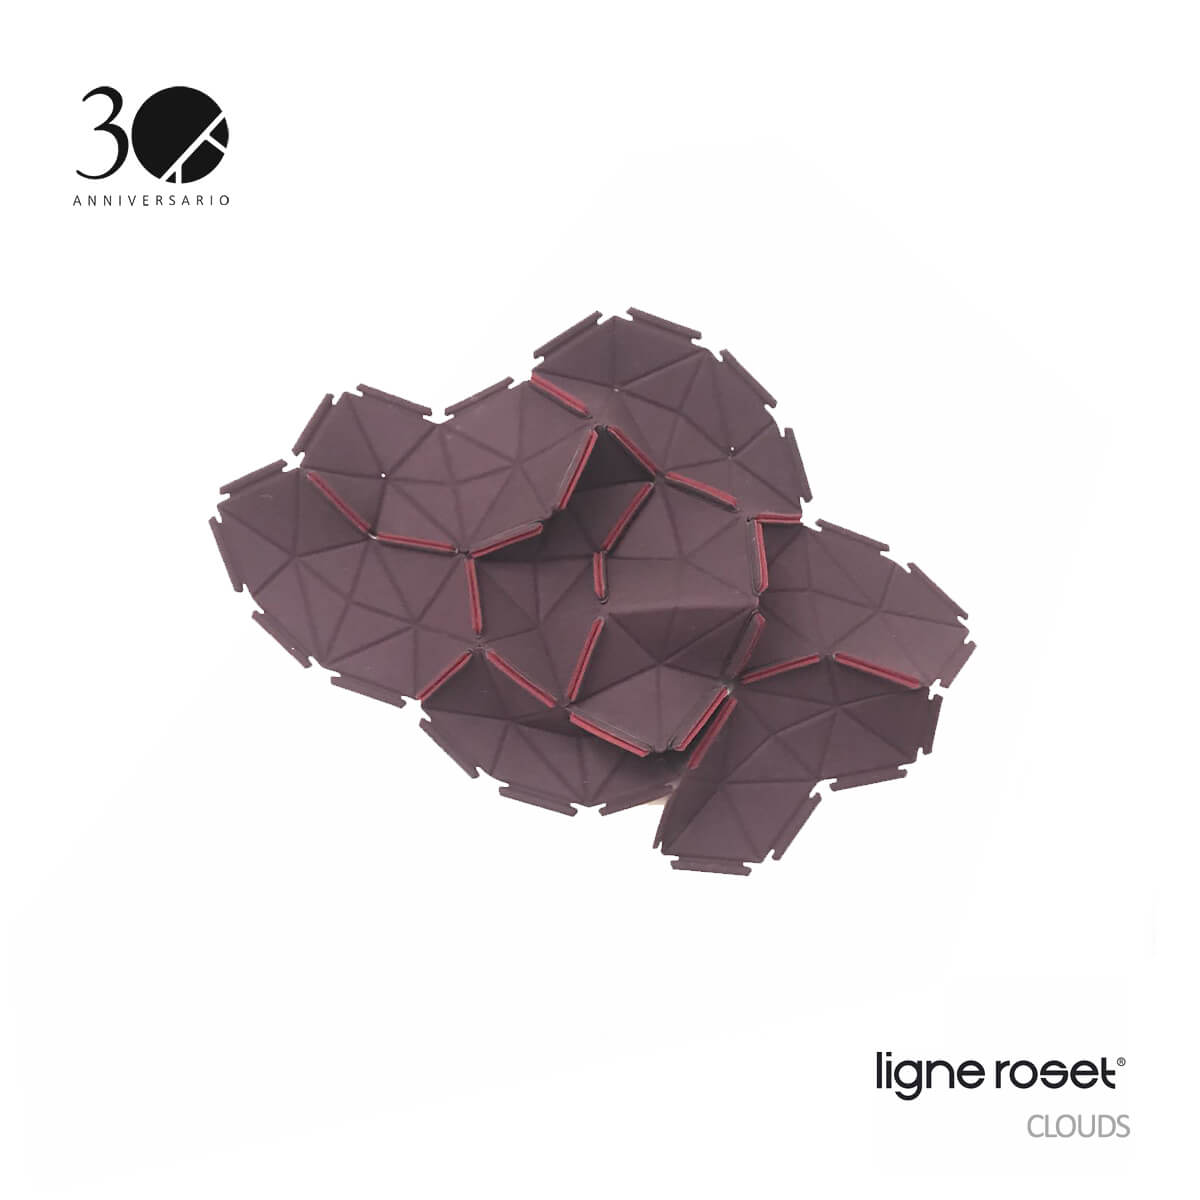 LIGNE-ROSET-CLOUDS-3